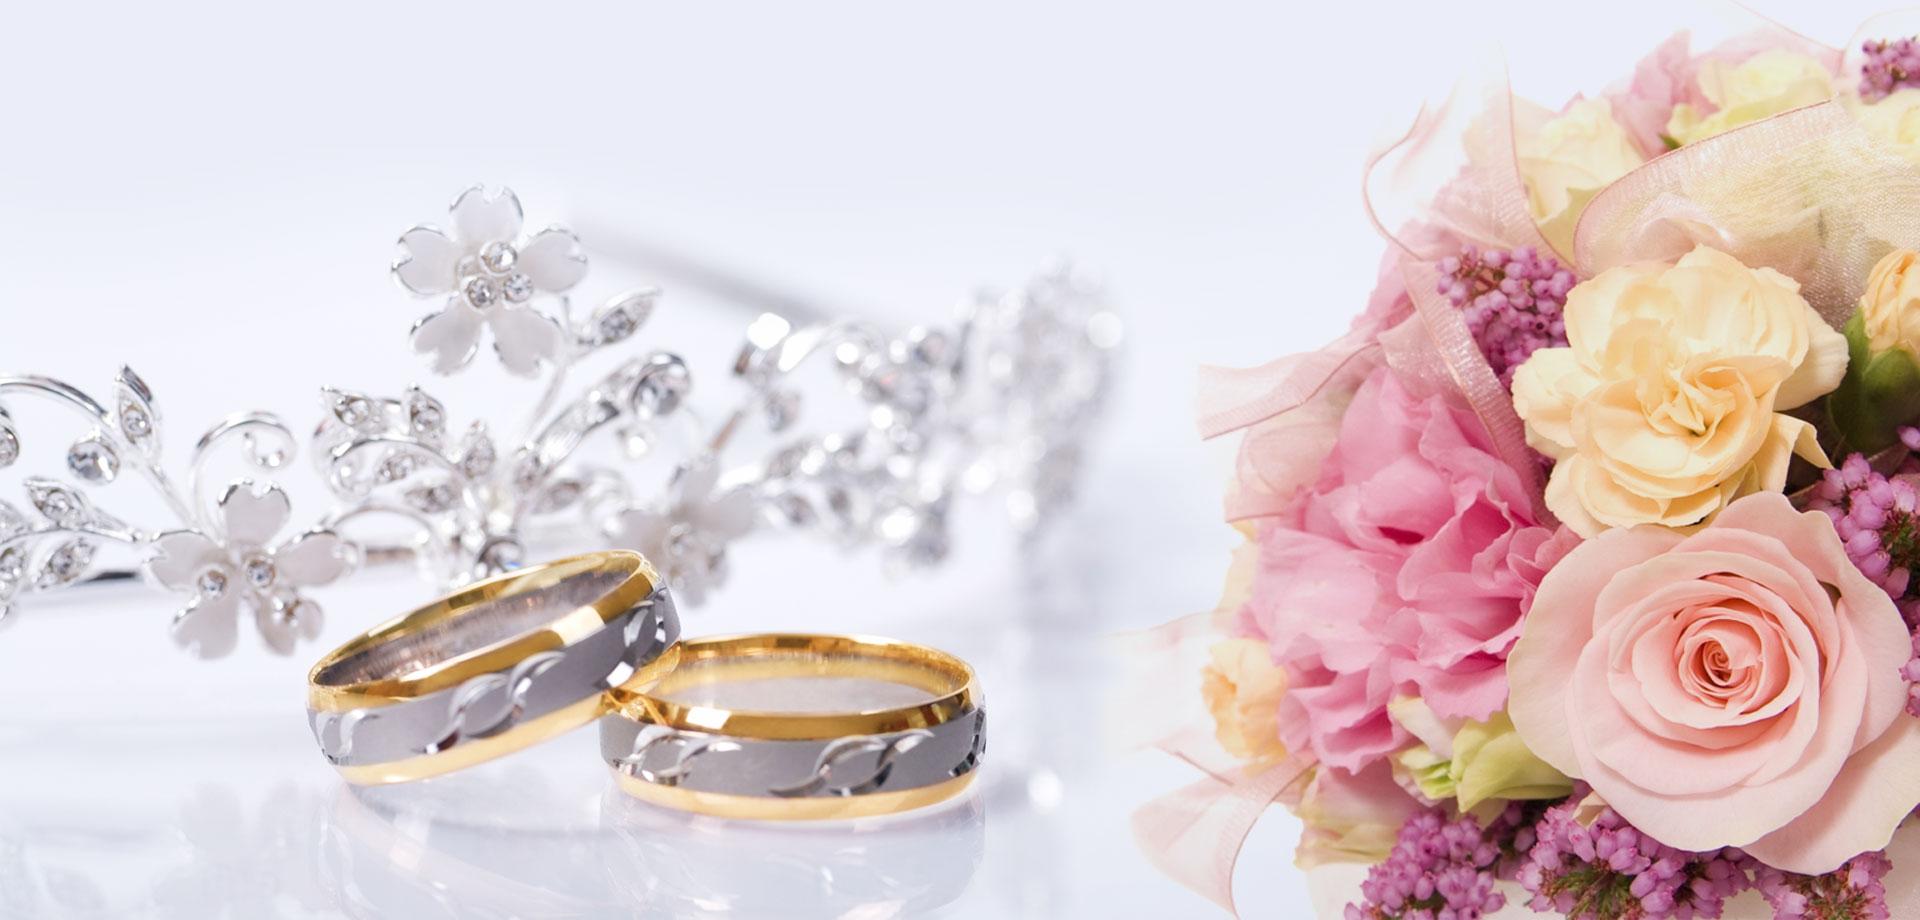 villa-selmi-ristorante-matrimoni-2